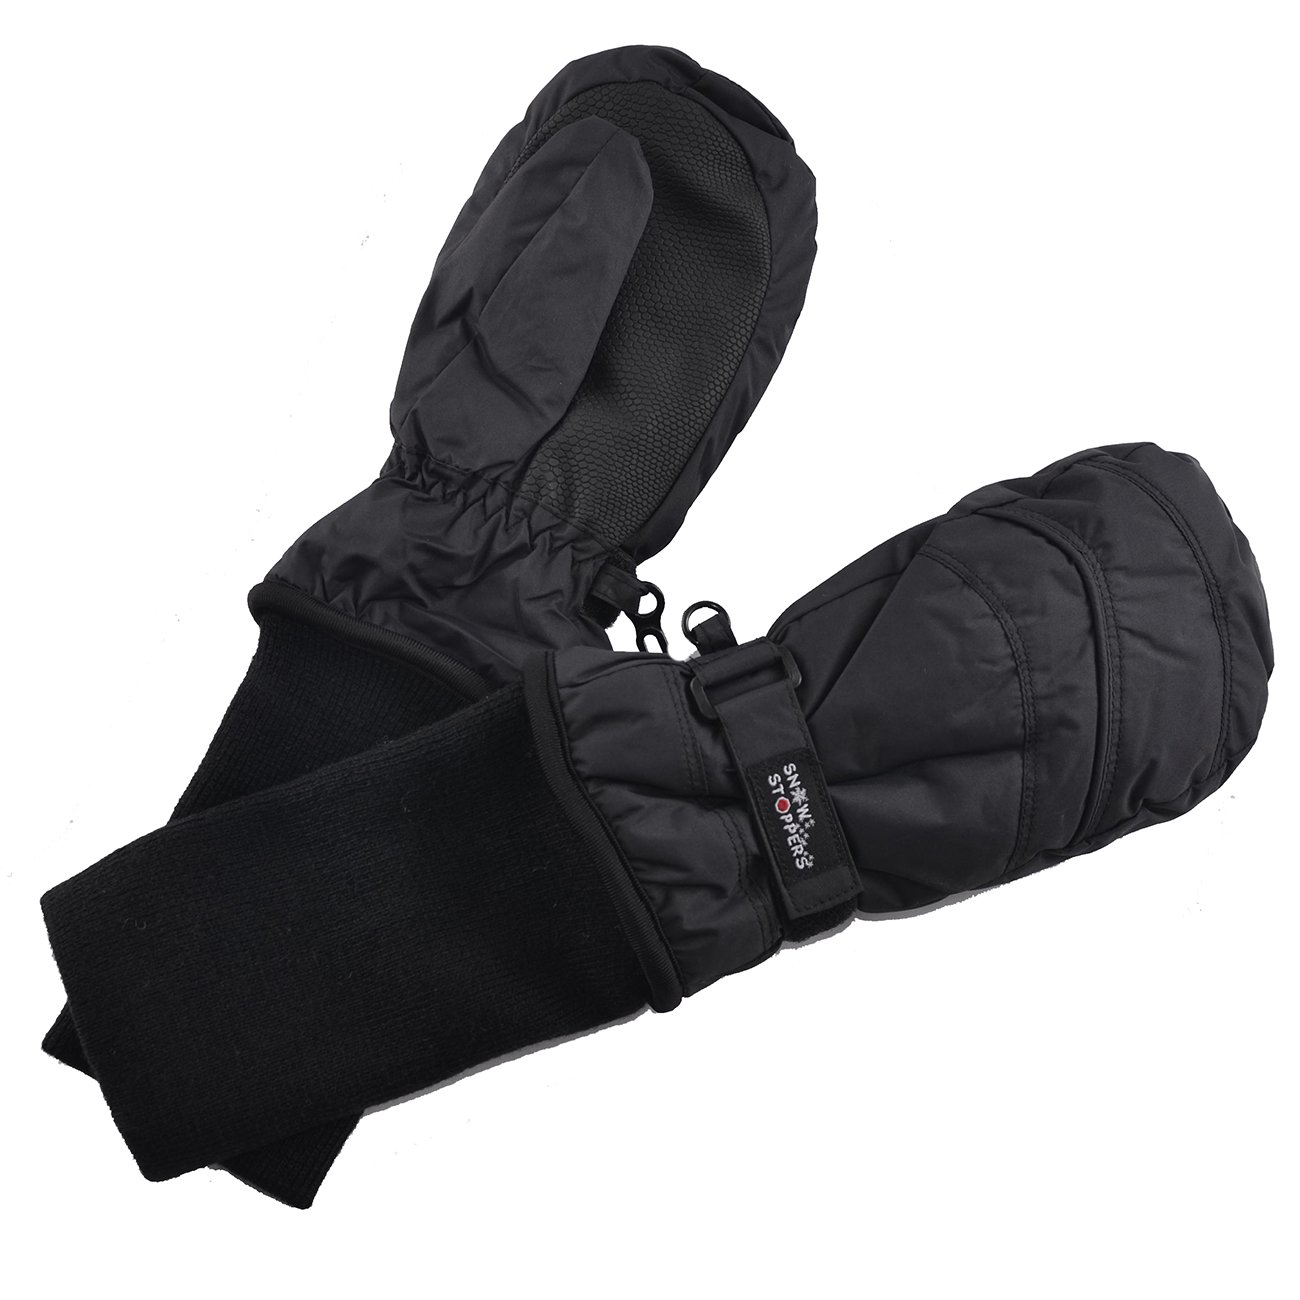 SnowStoppers Kids Waterproof Stay On Winter Nylon Mittens Medium 2-5 Years Black